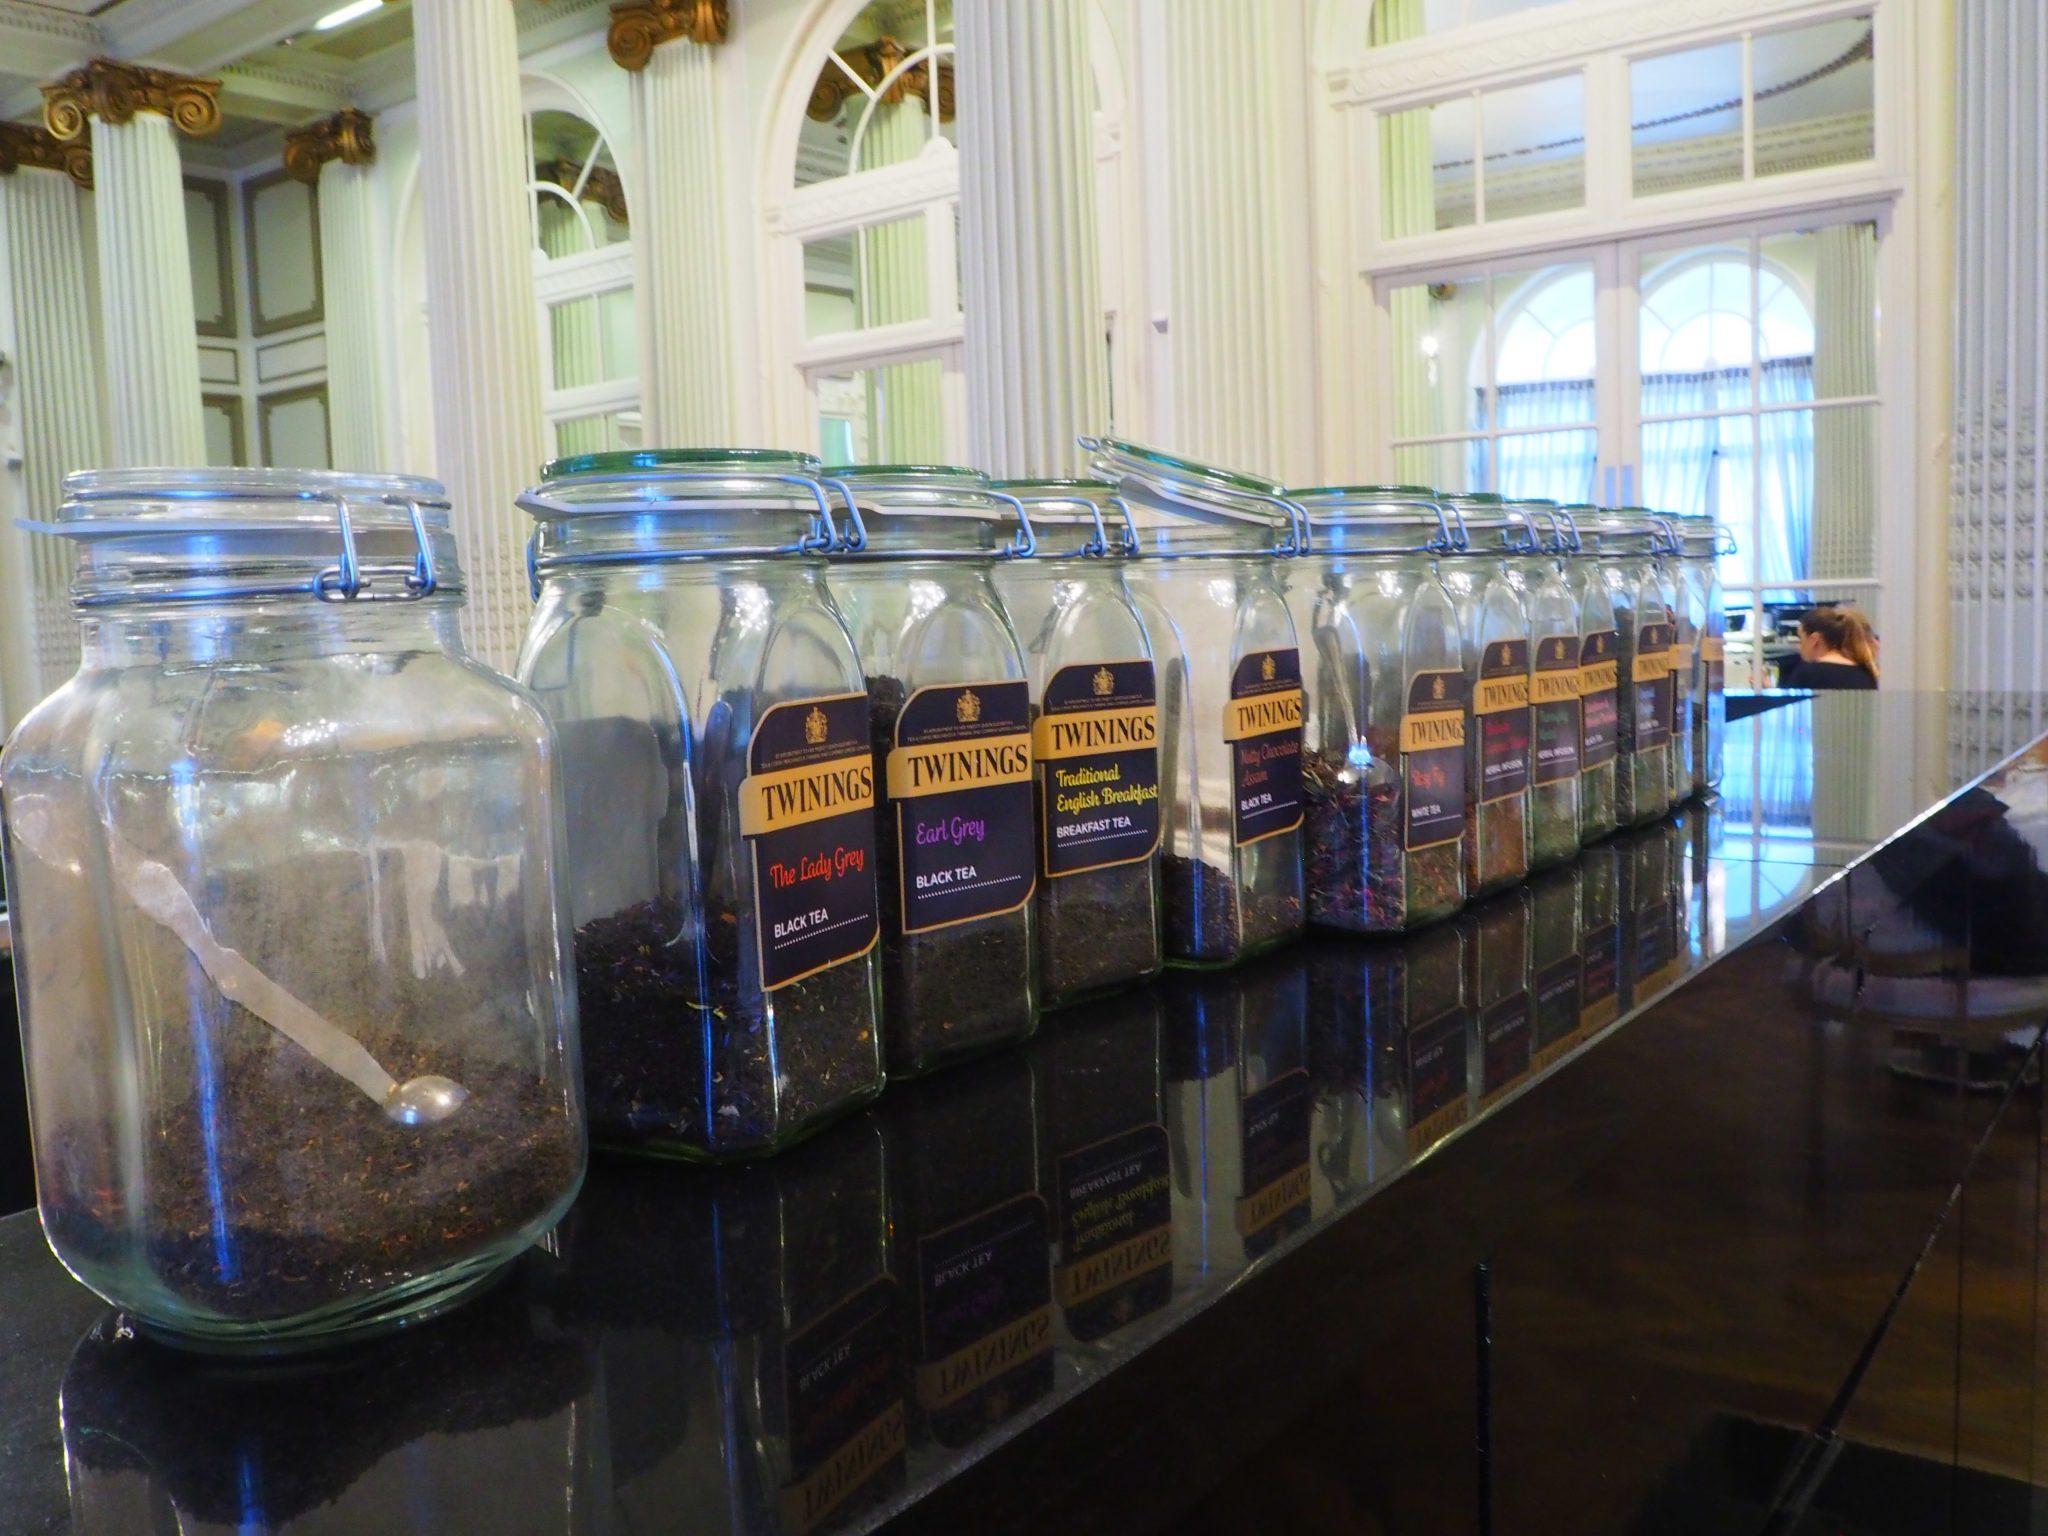 The Twinings Teas - The Waldorf Hilton Hotel London Afternoon Tea